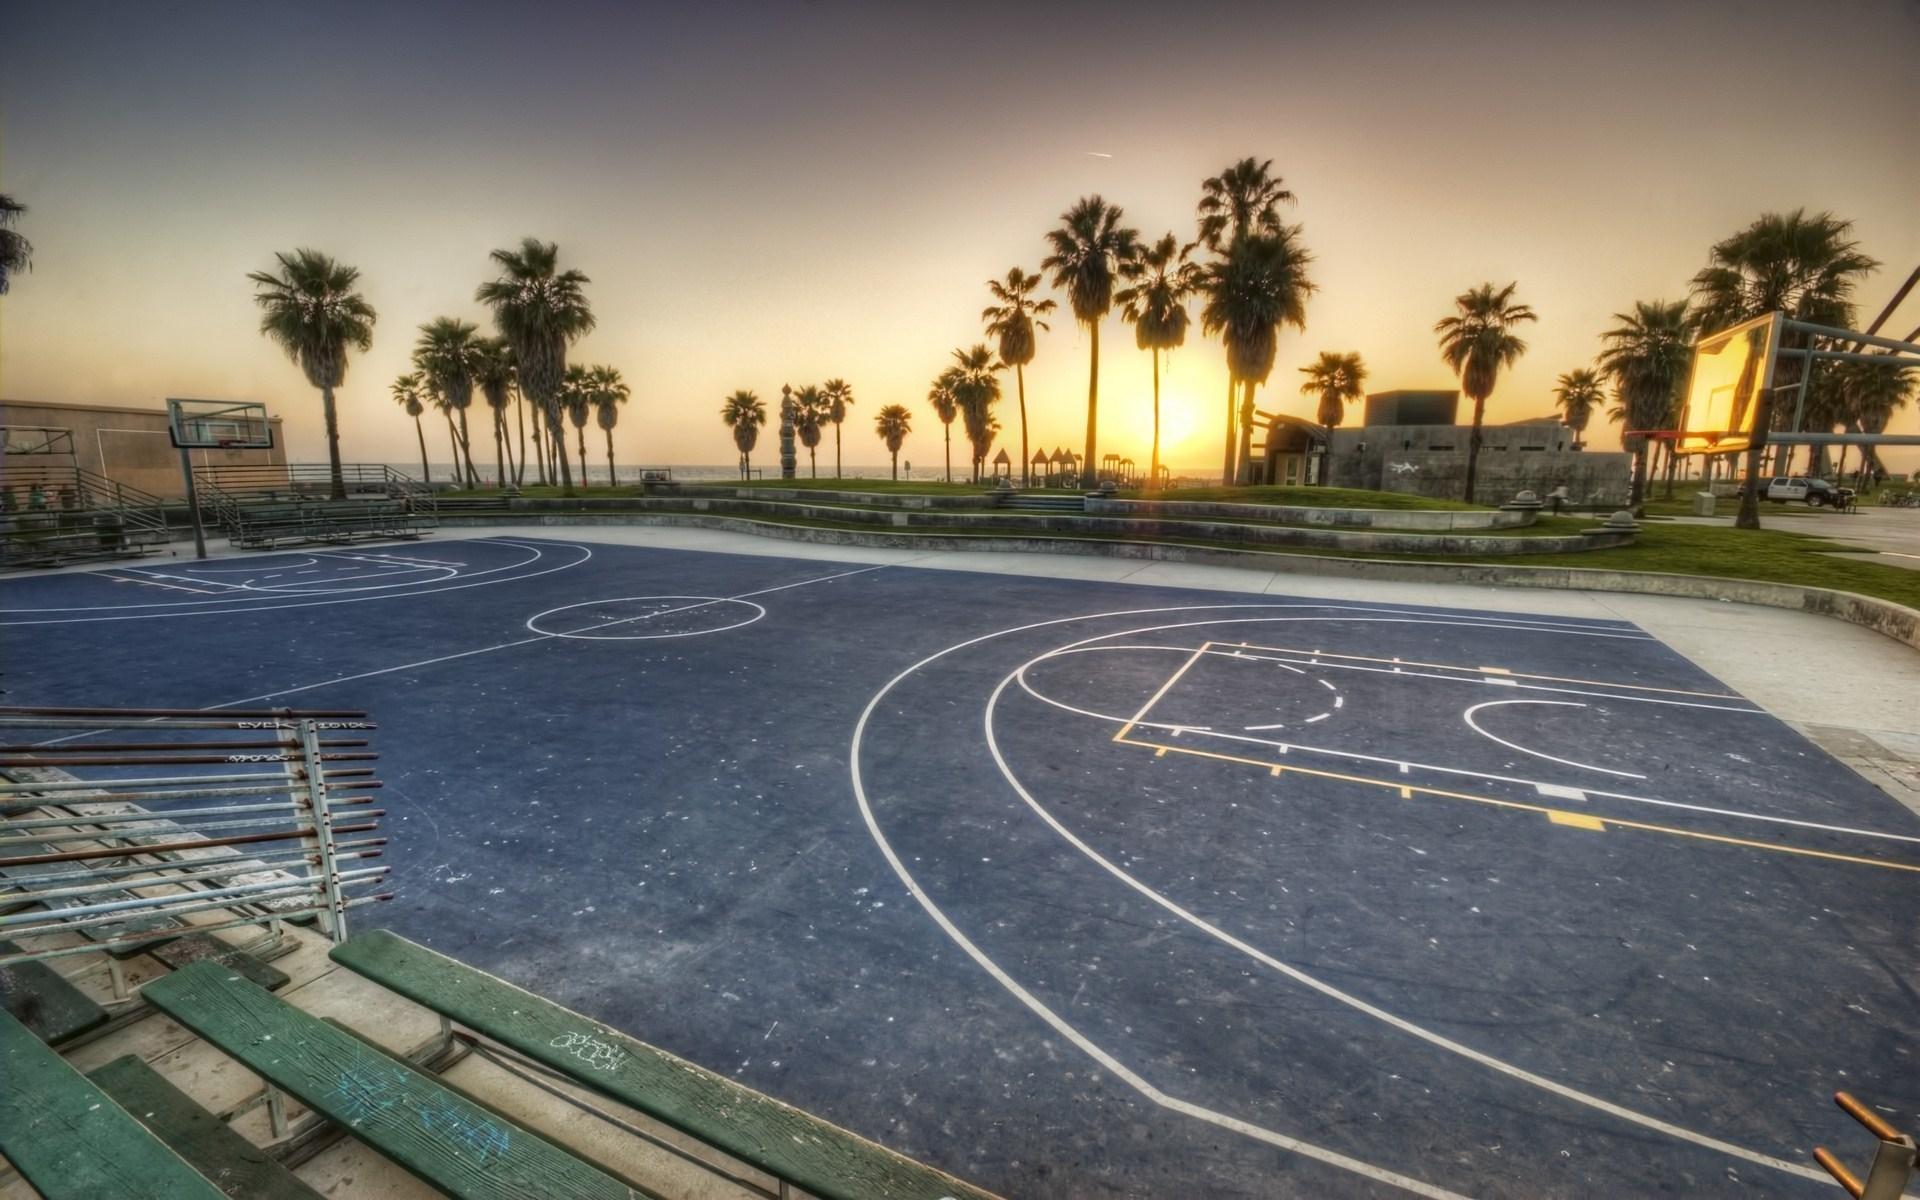 Basketball HD Wallpaper Background Image 1920x1200 ID213776 1920x1200